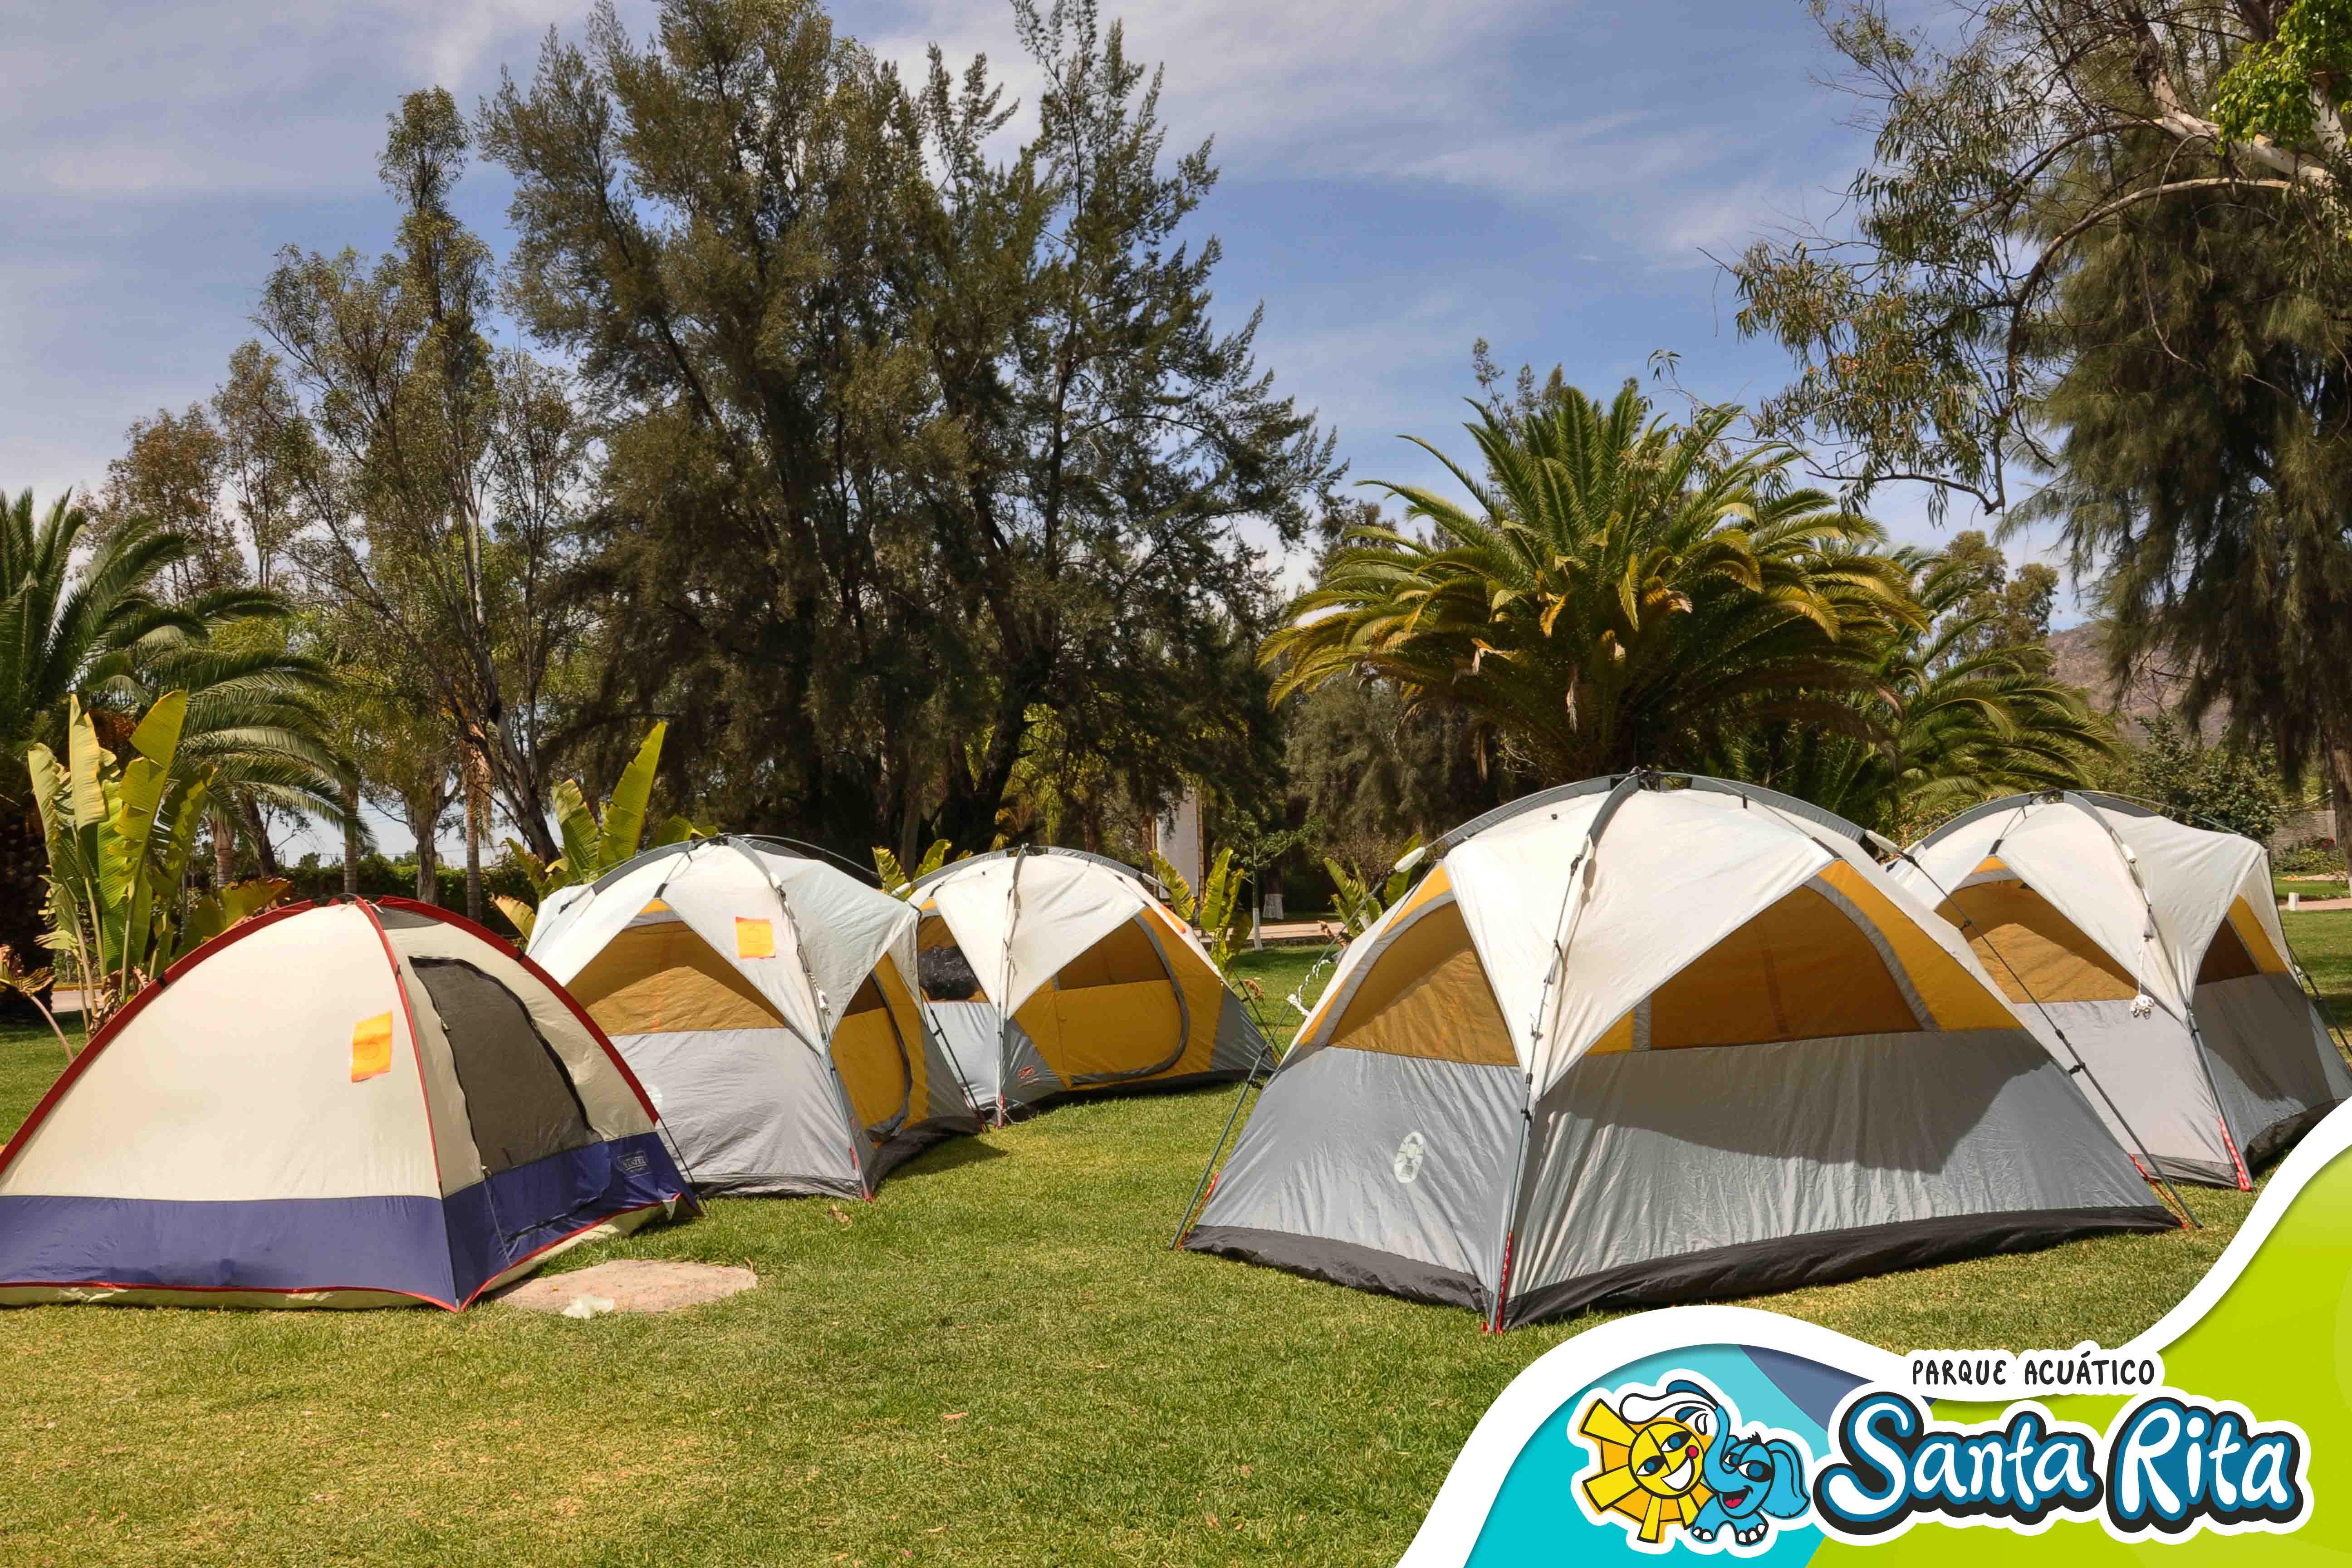 Campingparqueacuaticosantarita